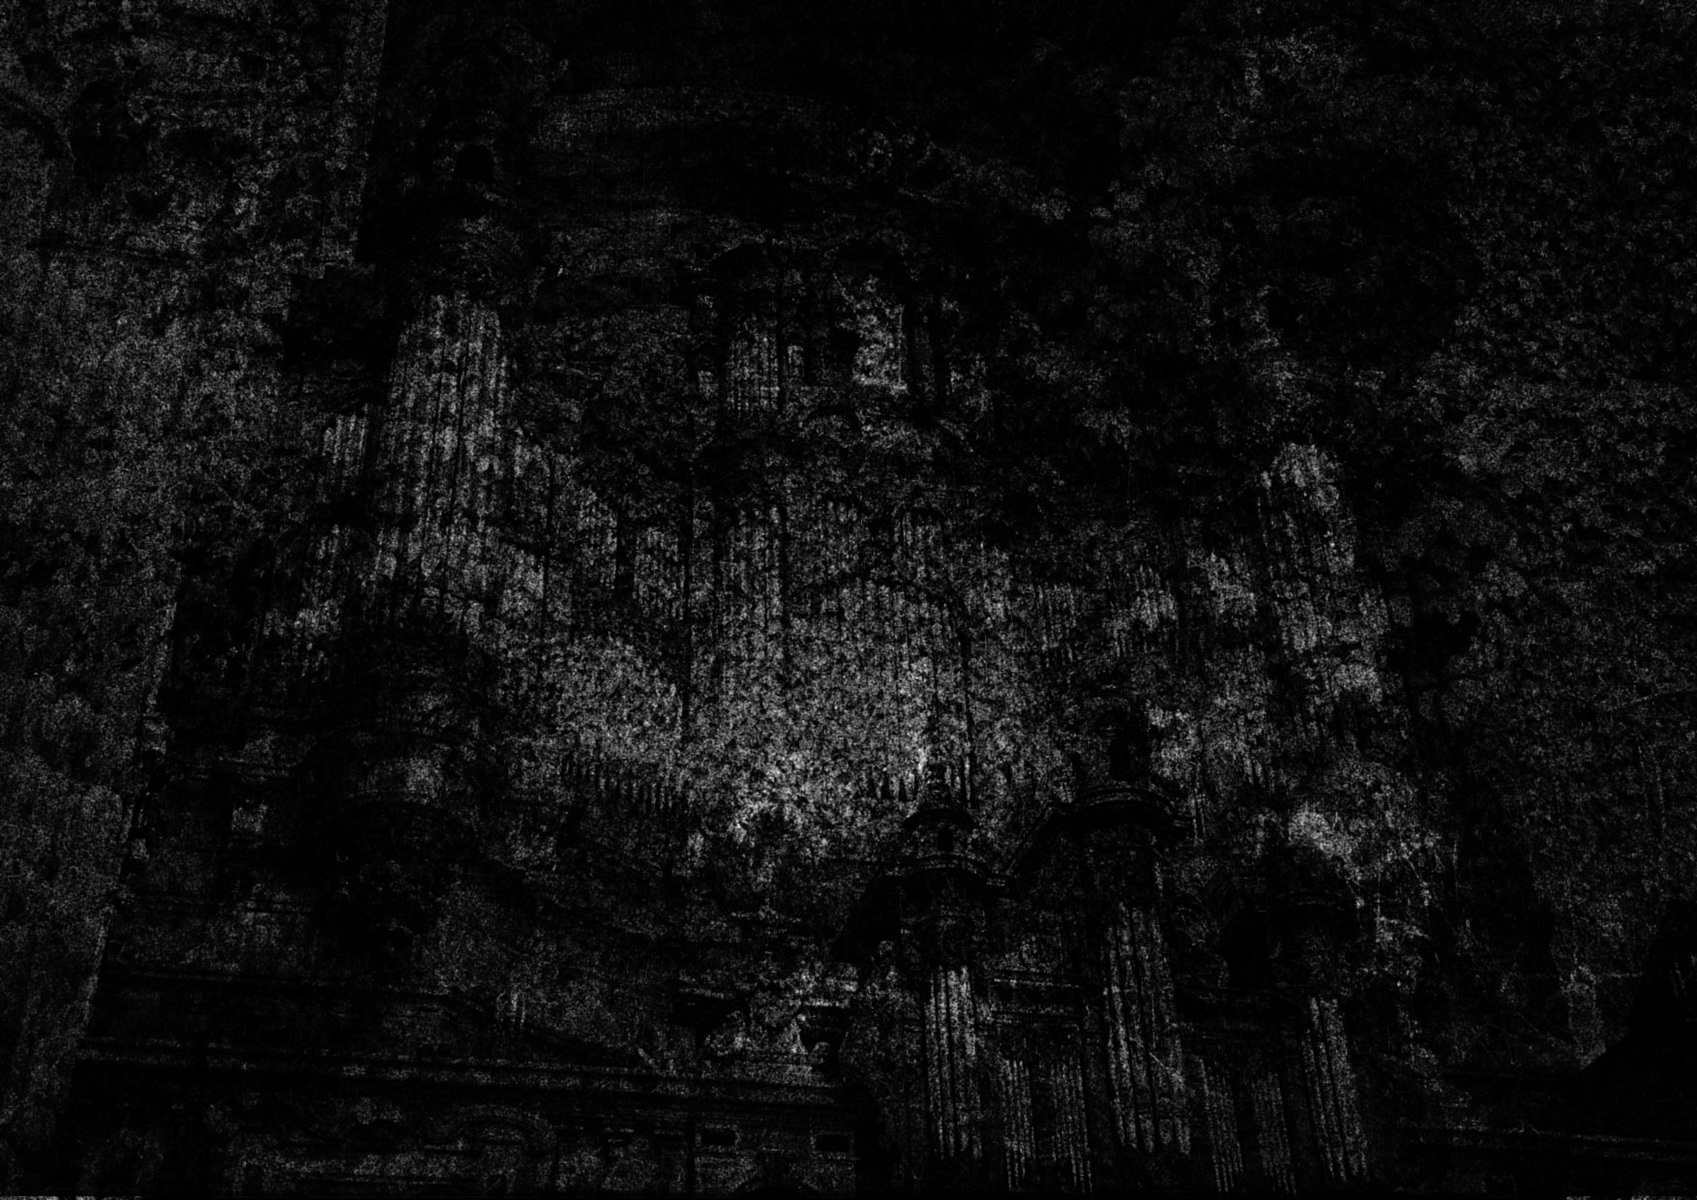 protasiuk - The Narrow Daylight 5